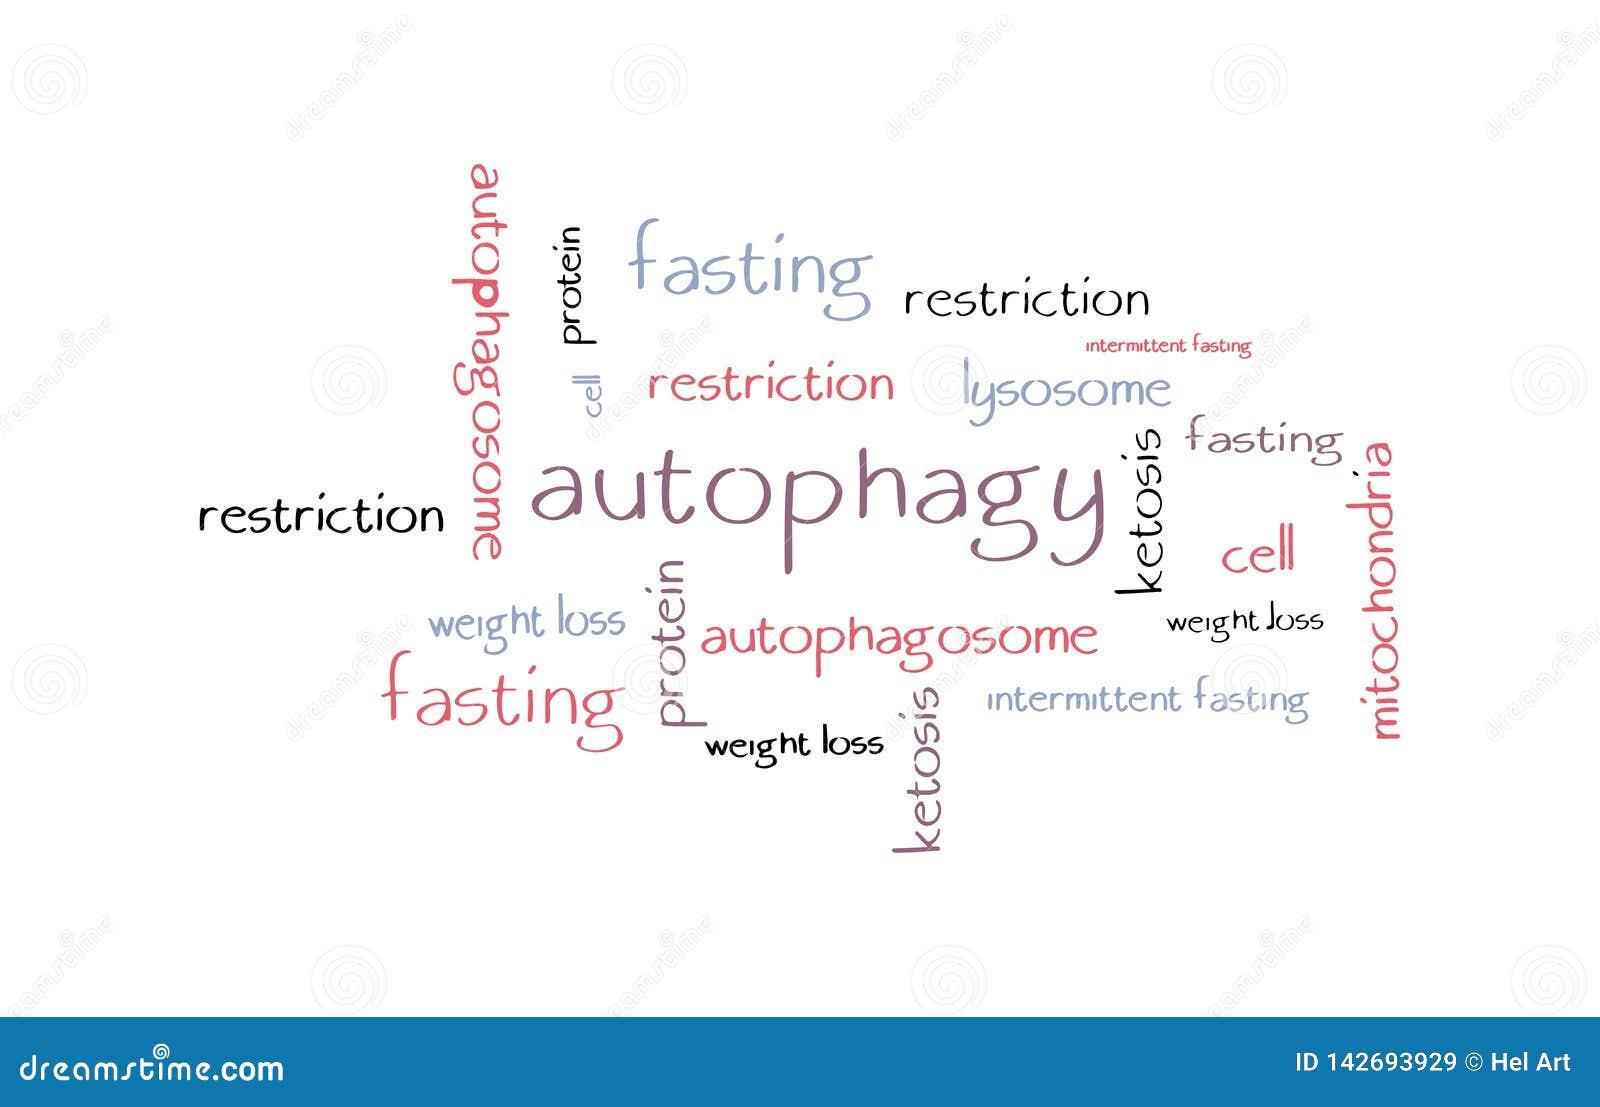 Autophagy Stock Illustrations – 24 Autophagy Stock Illustrations